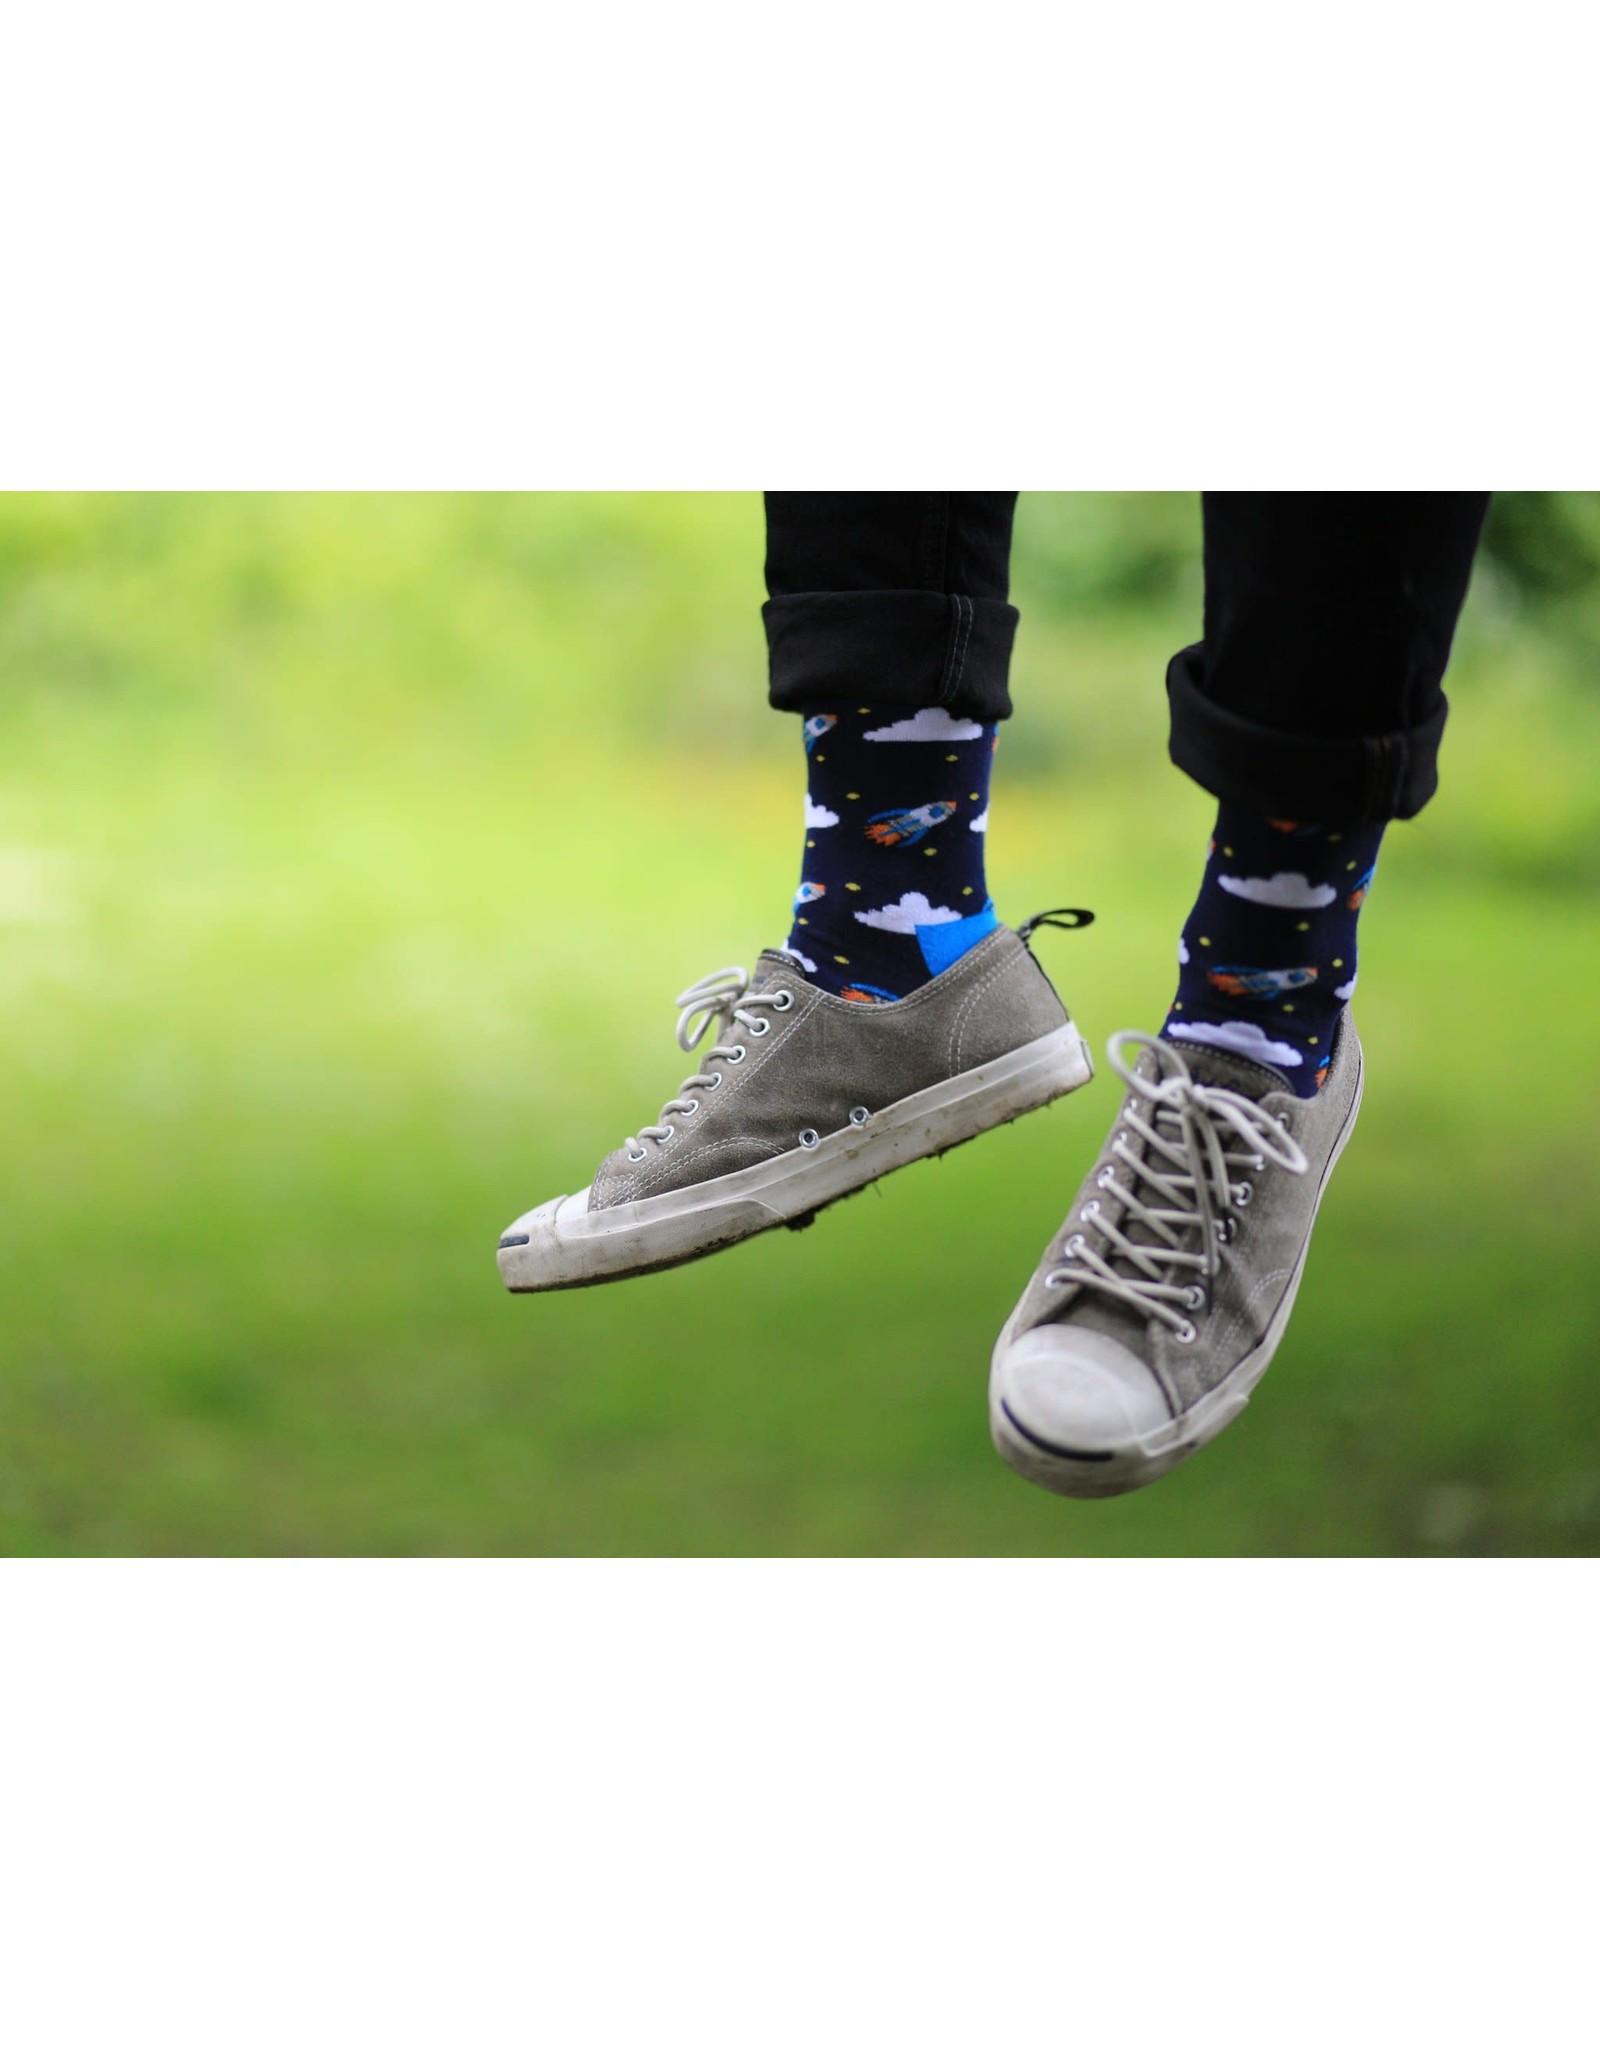 Moustard socks - rockets (41-46)